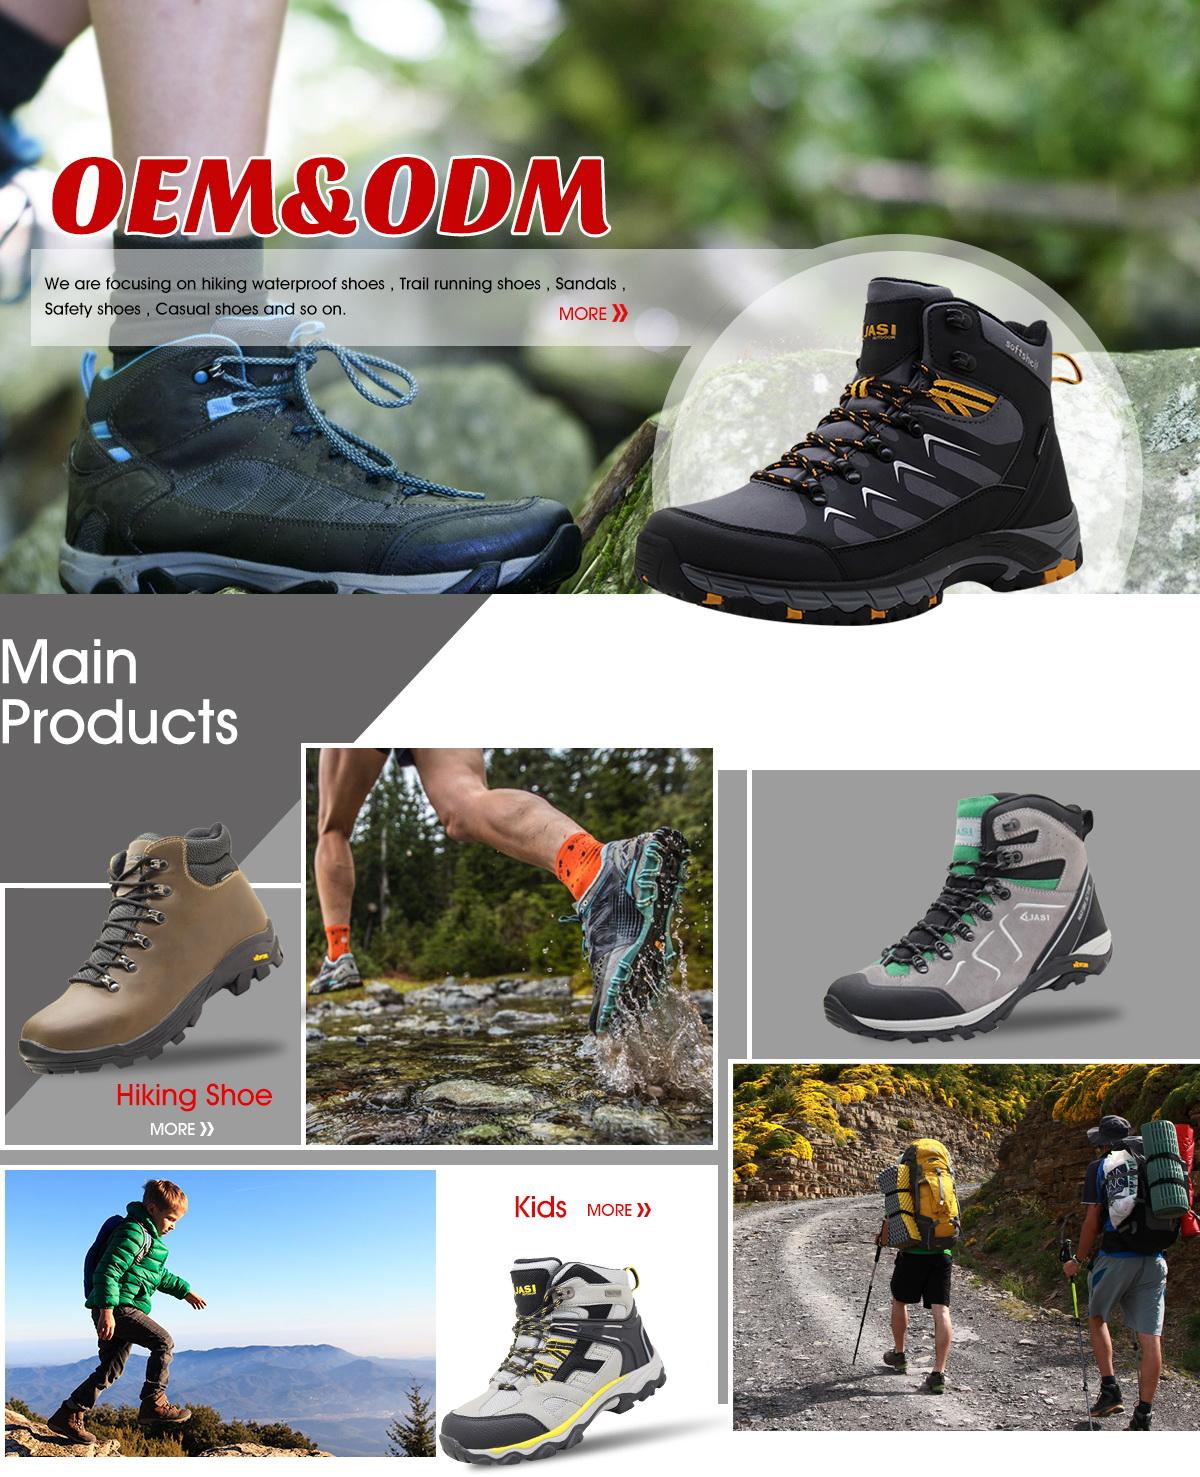 aea9f348e00 Quanzhou Jasi Sports Co., Ltd. - Safety Shoes, Hiking Shoes